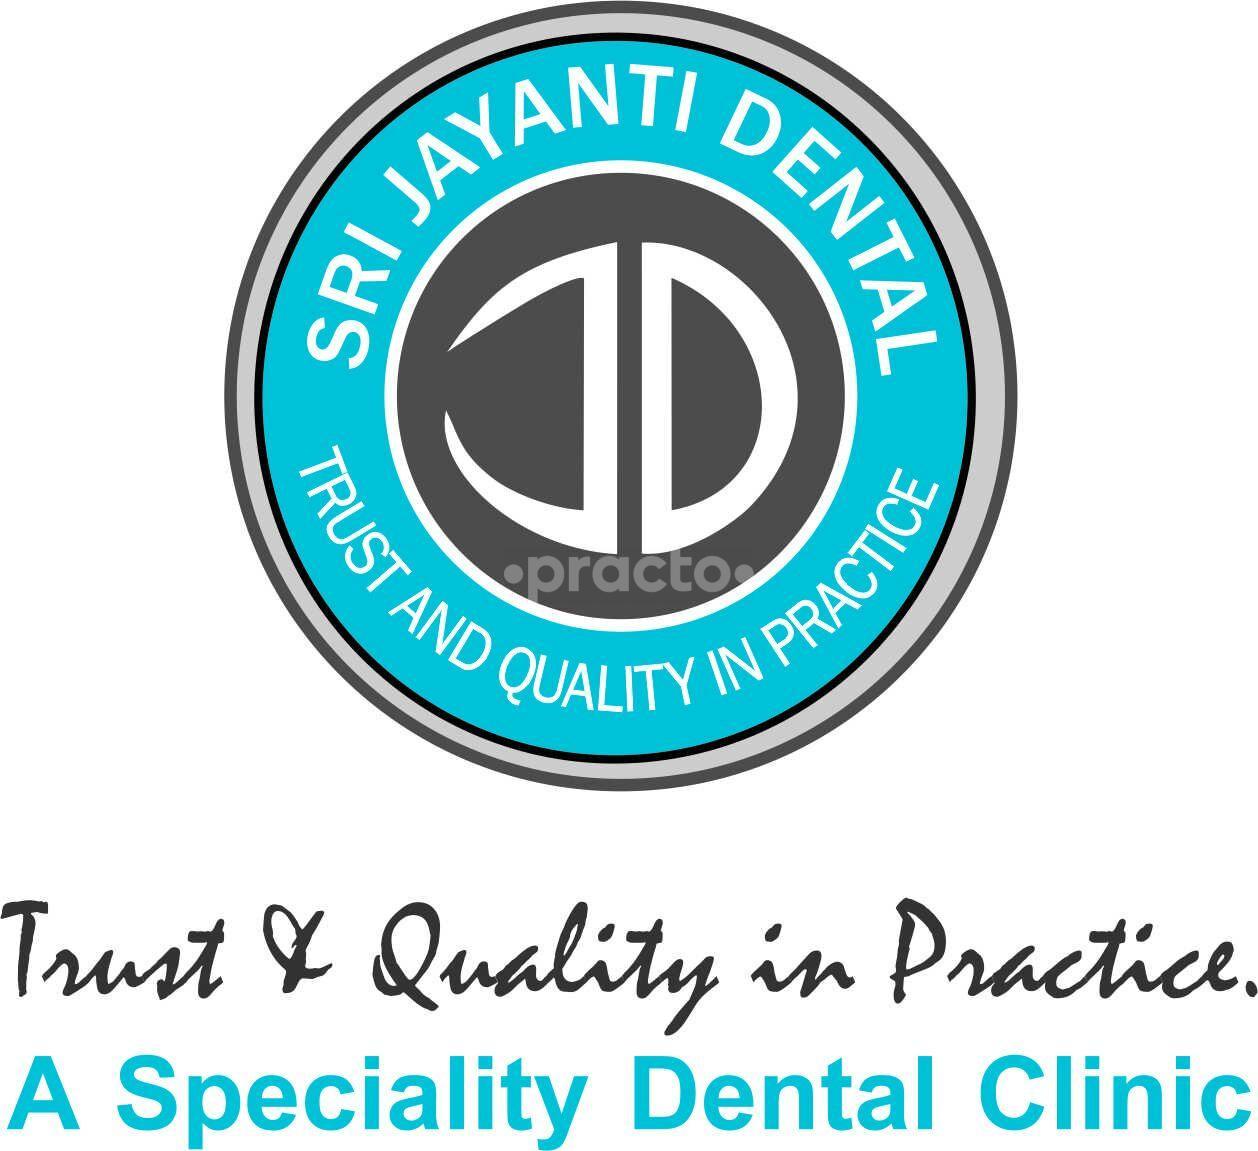 Sri Jayanti Dental - A Speciality Dental Clinic